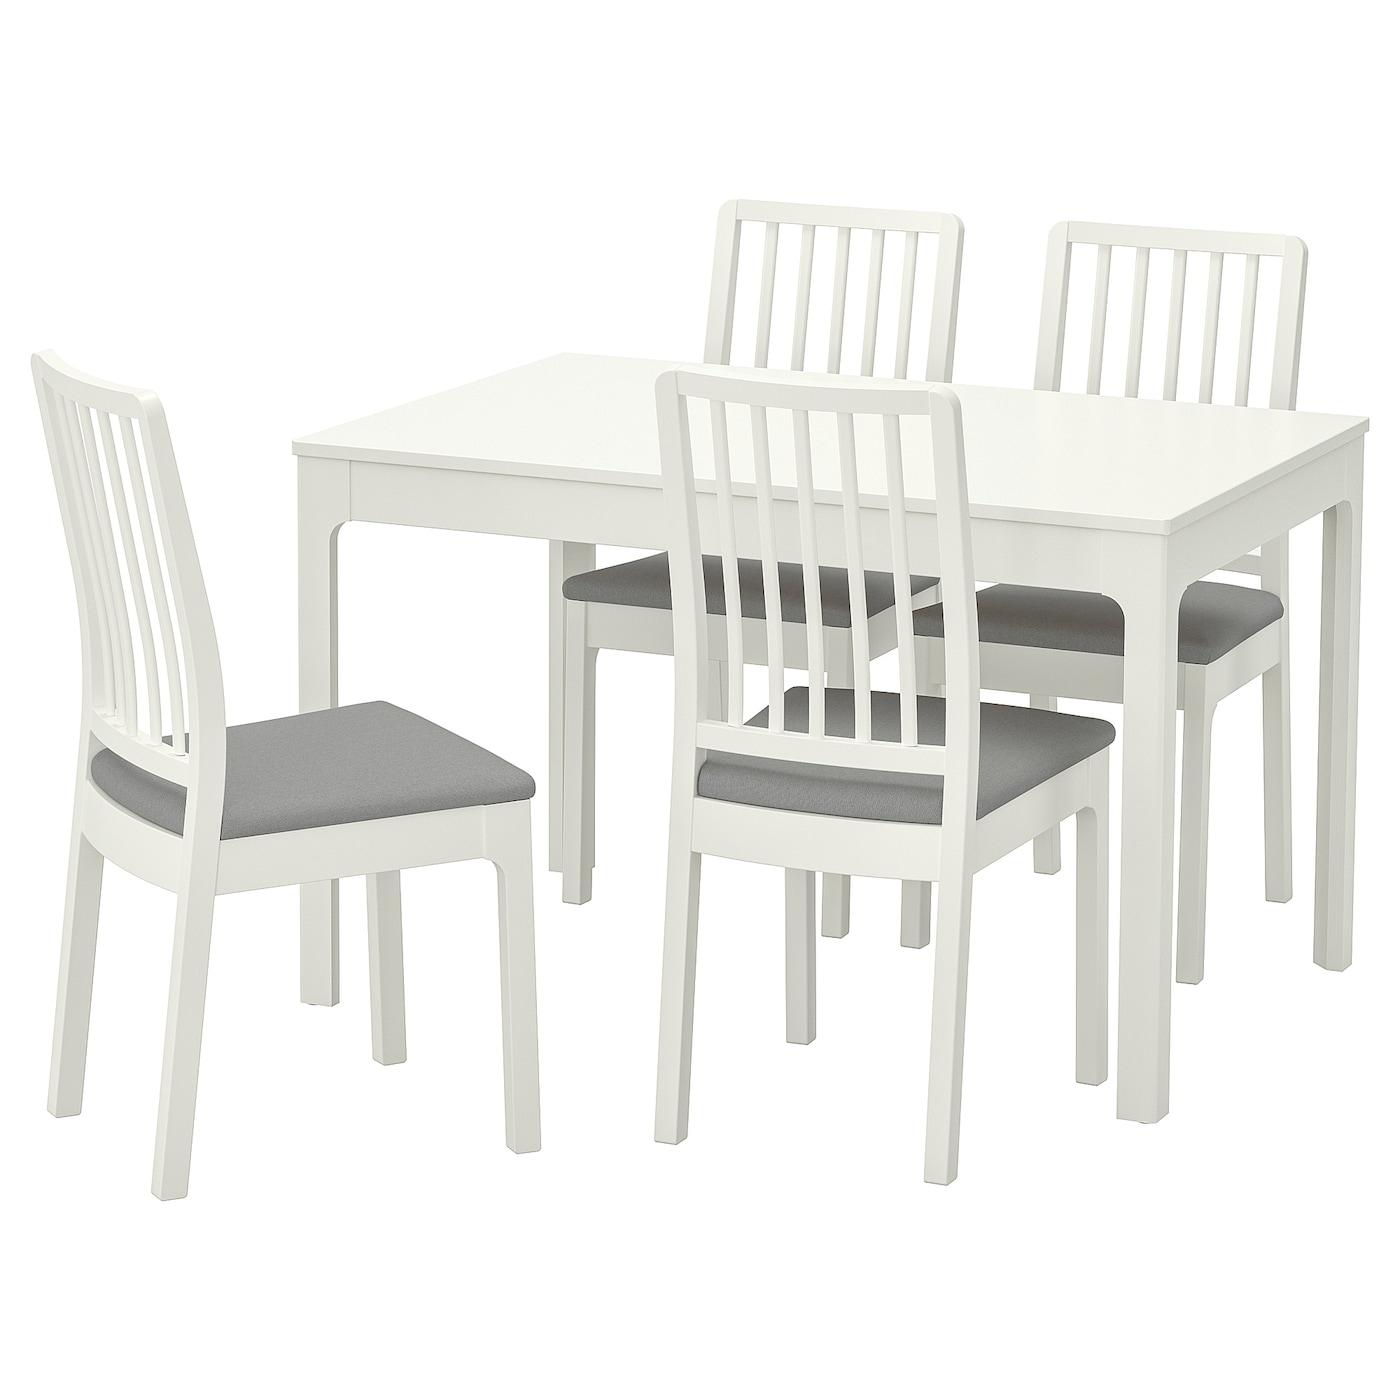 Tables - IKEA